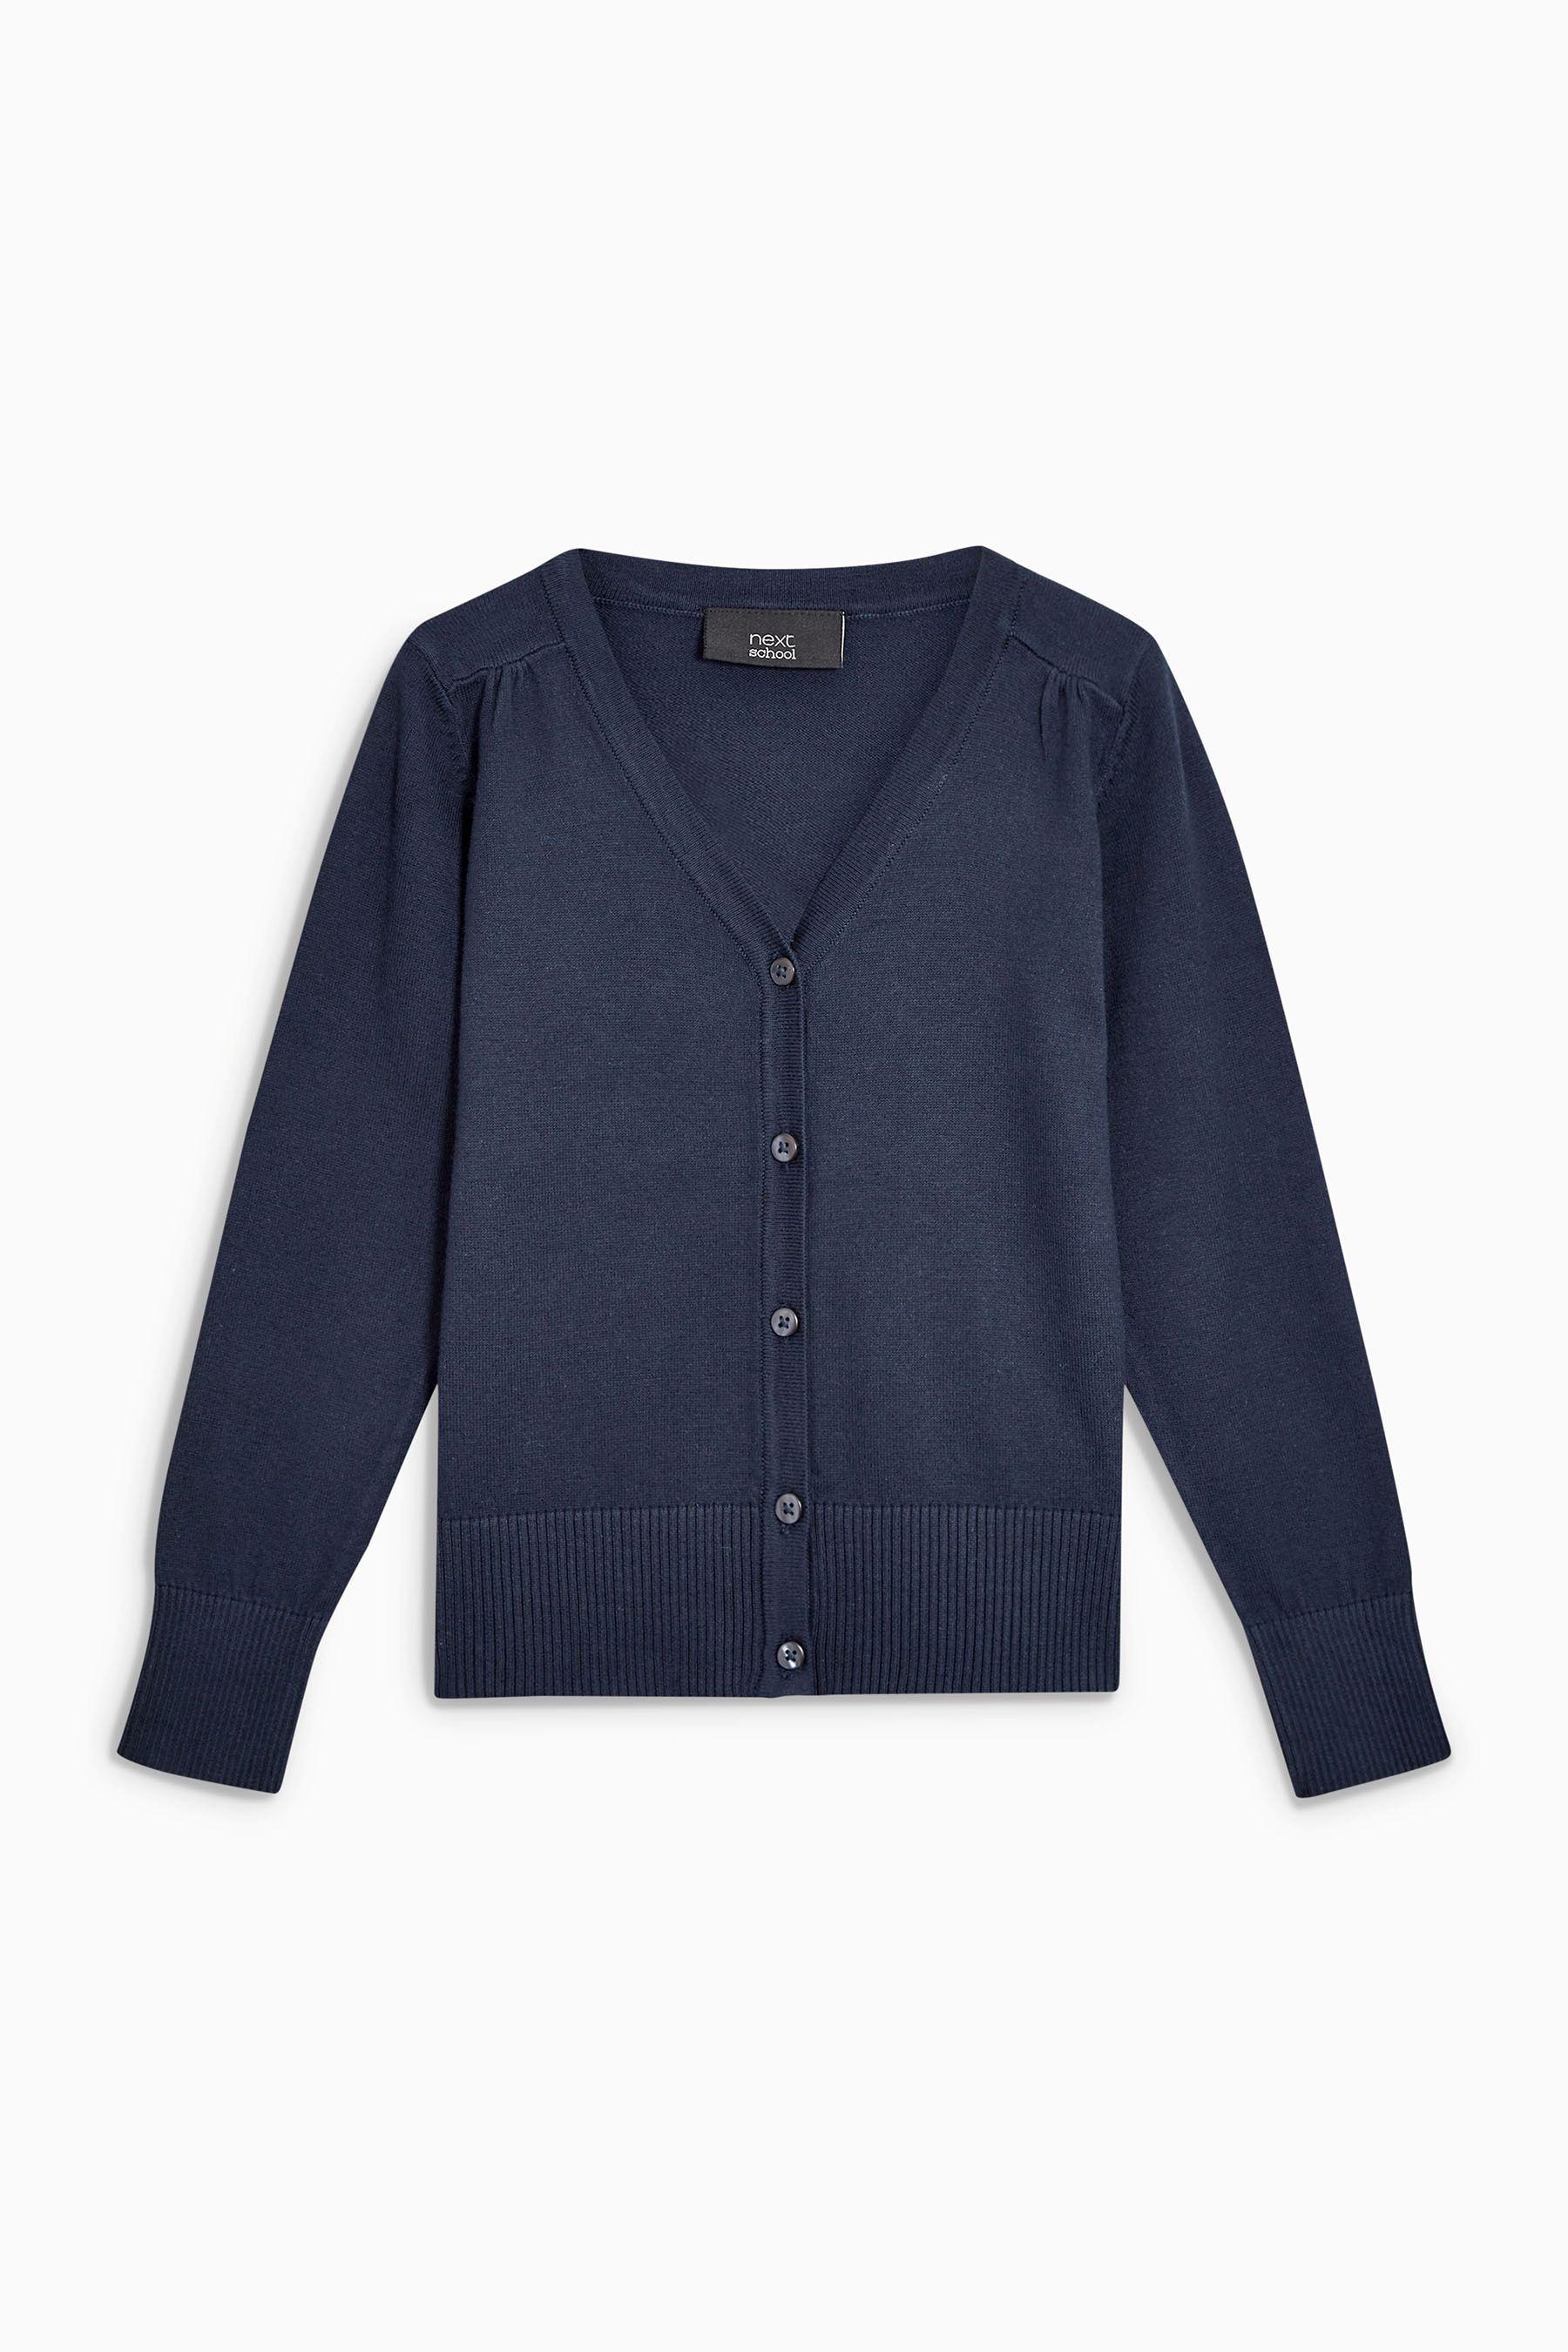 Girls Next Navy V Neck Cardigan Two Pack (3 16yrs) Blue